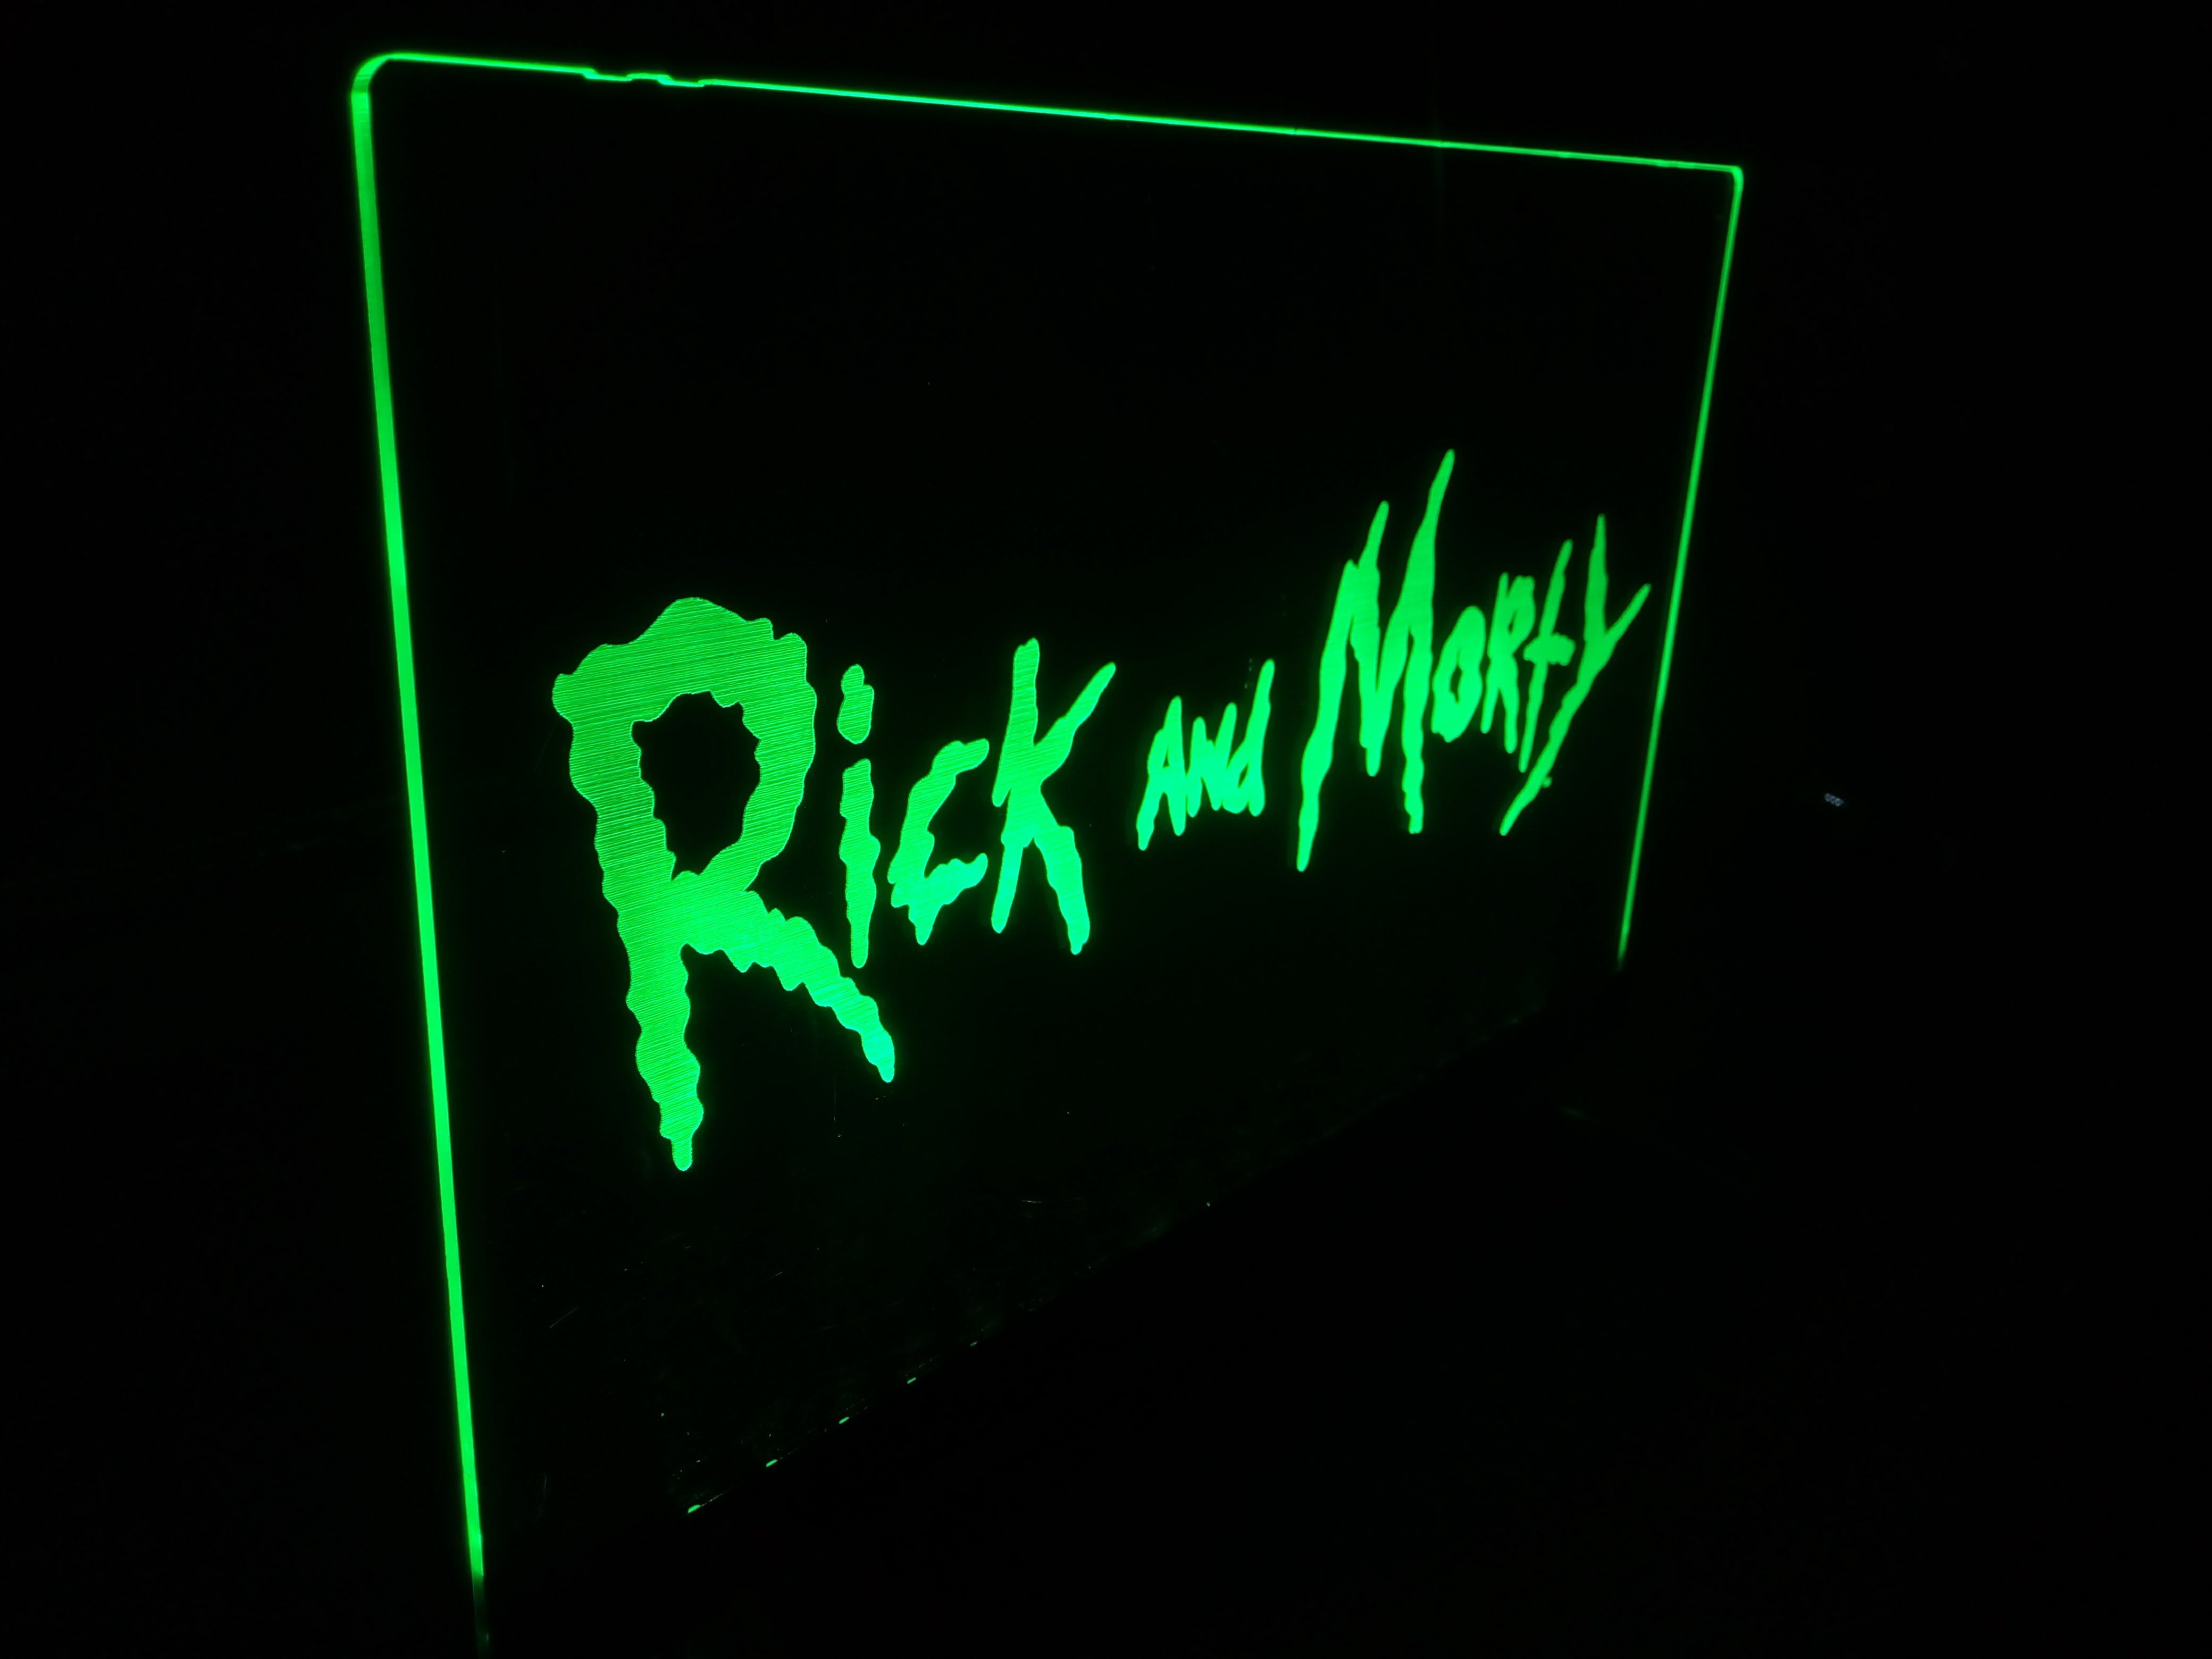 Rick and Morty logo lamp on wall night light on wall nightlight wall lamp gamer game room decor